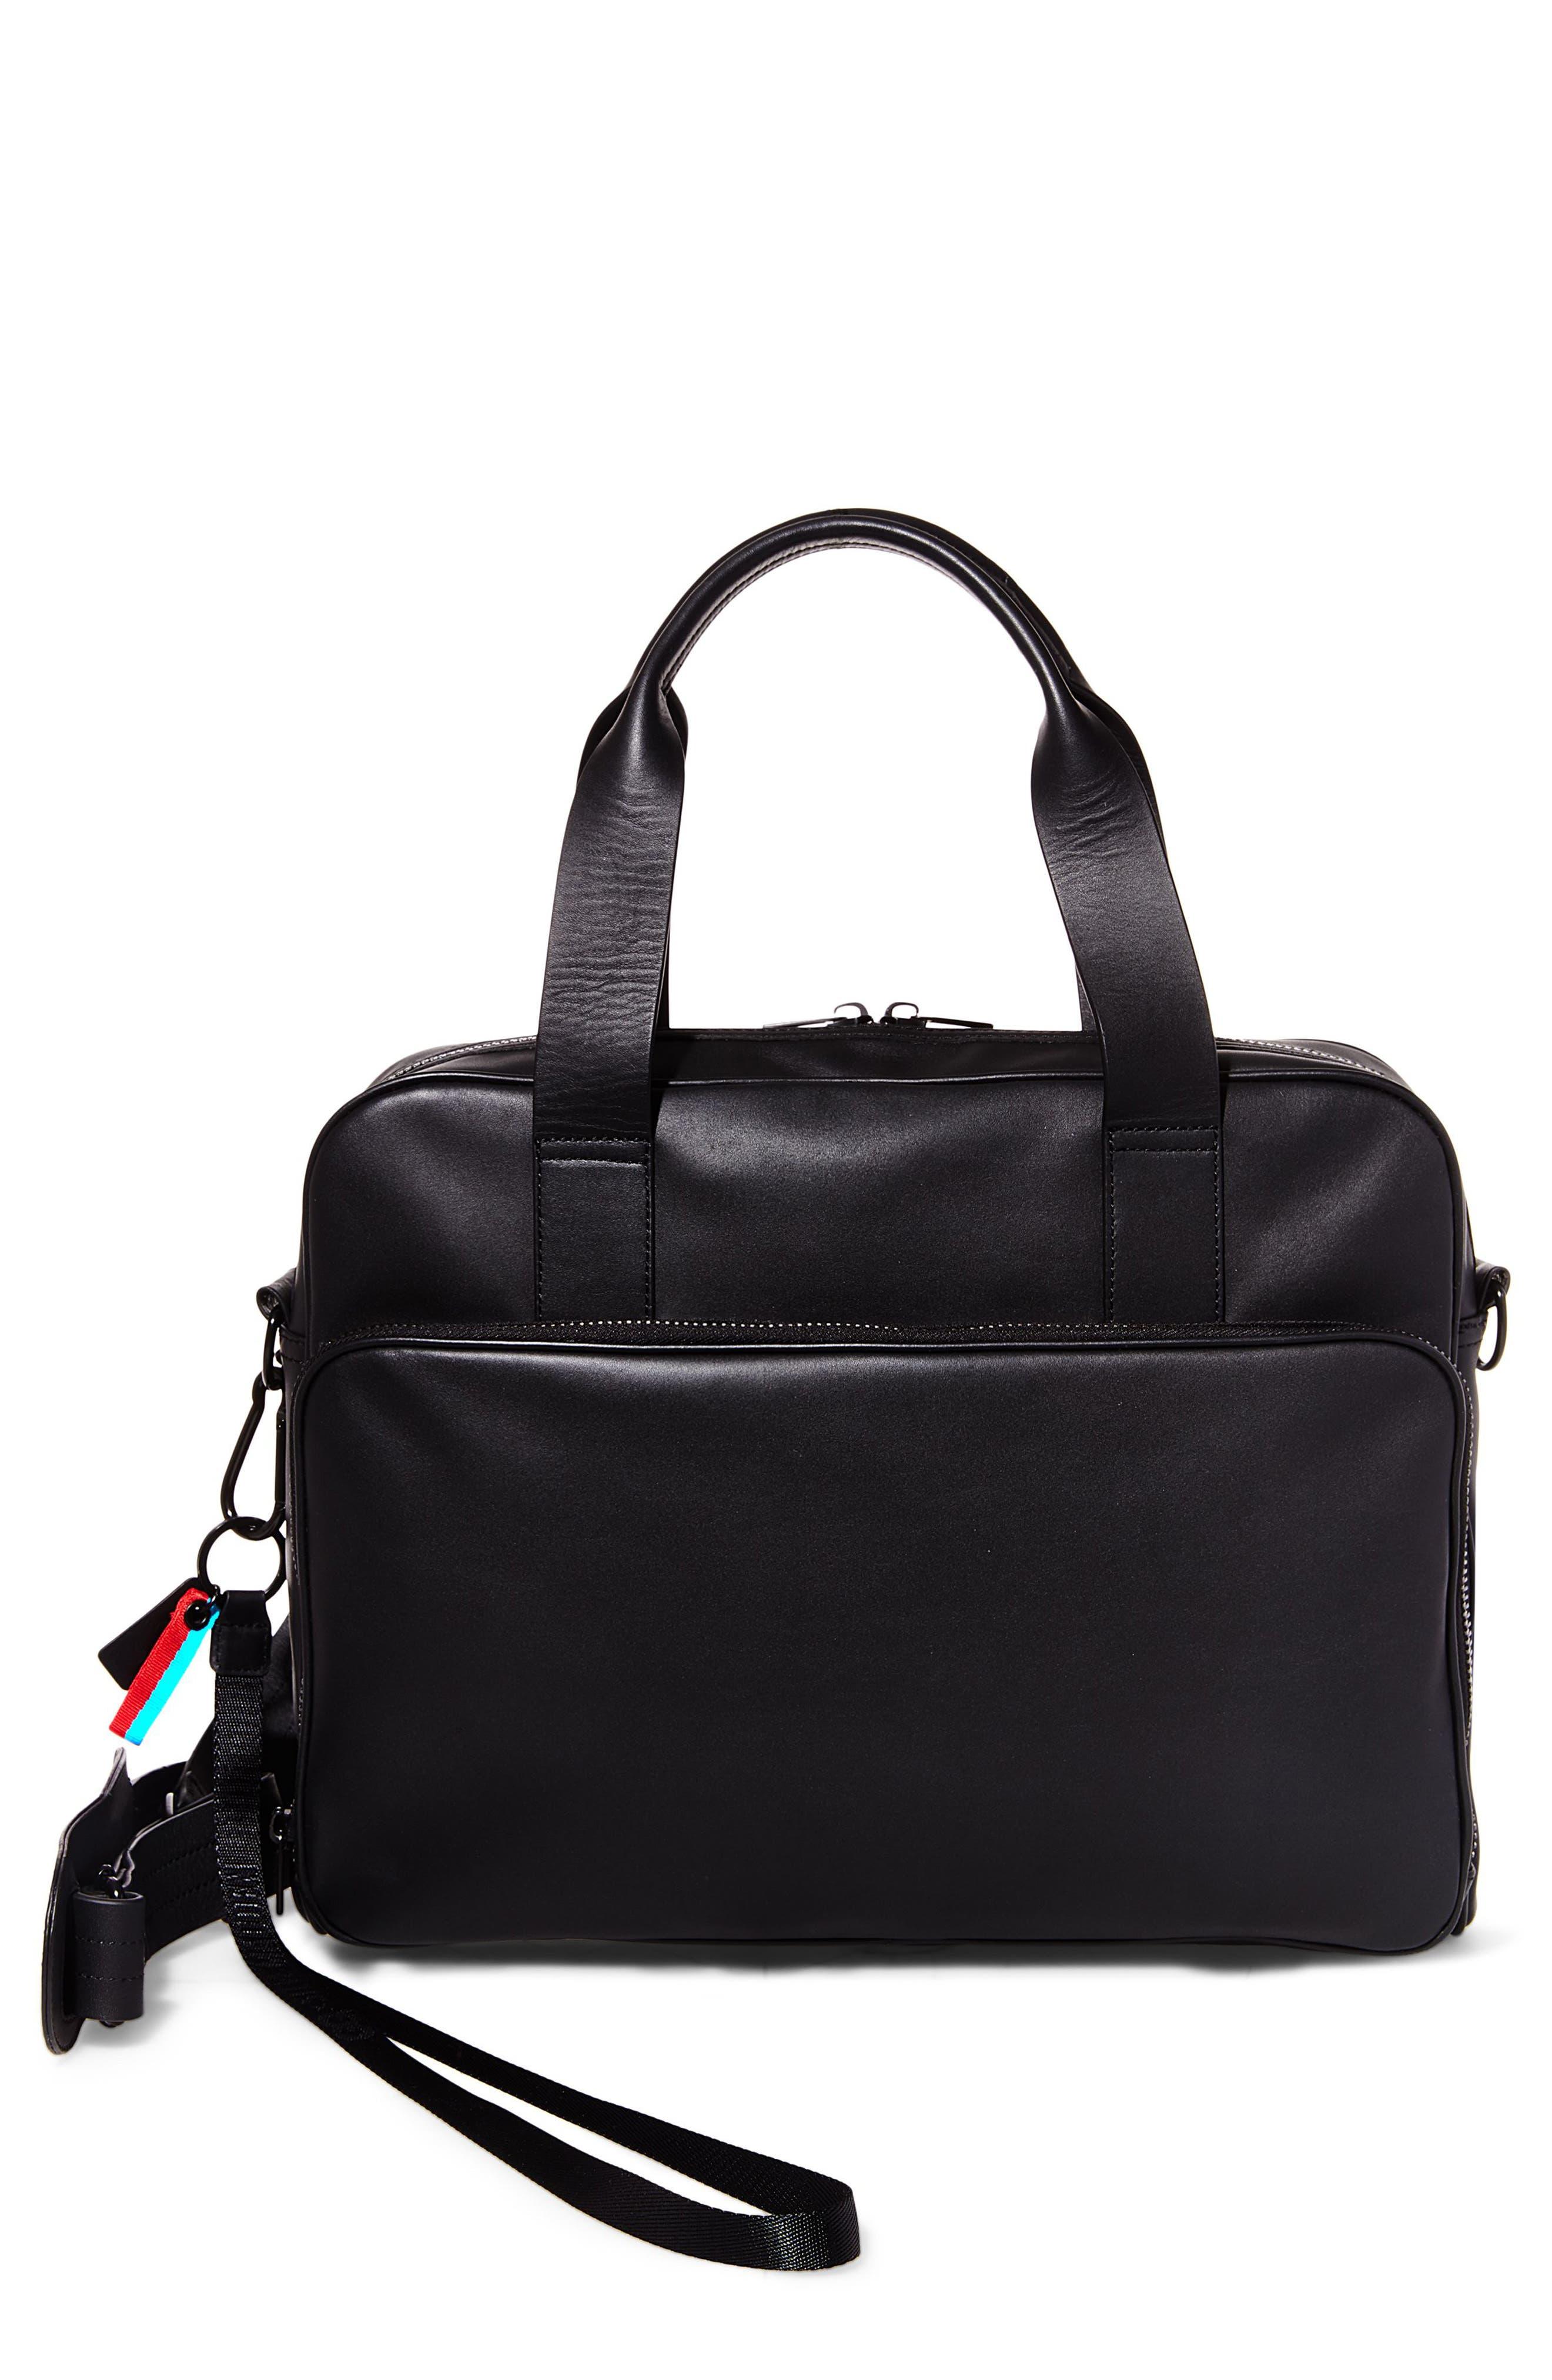 GQ x Steve Madden Leather Computer Bag